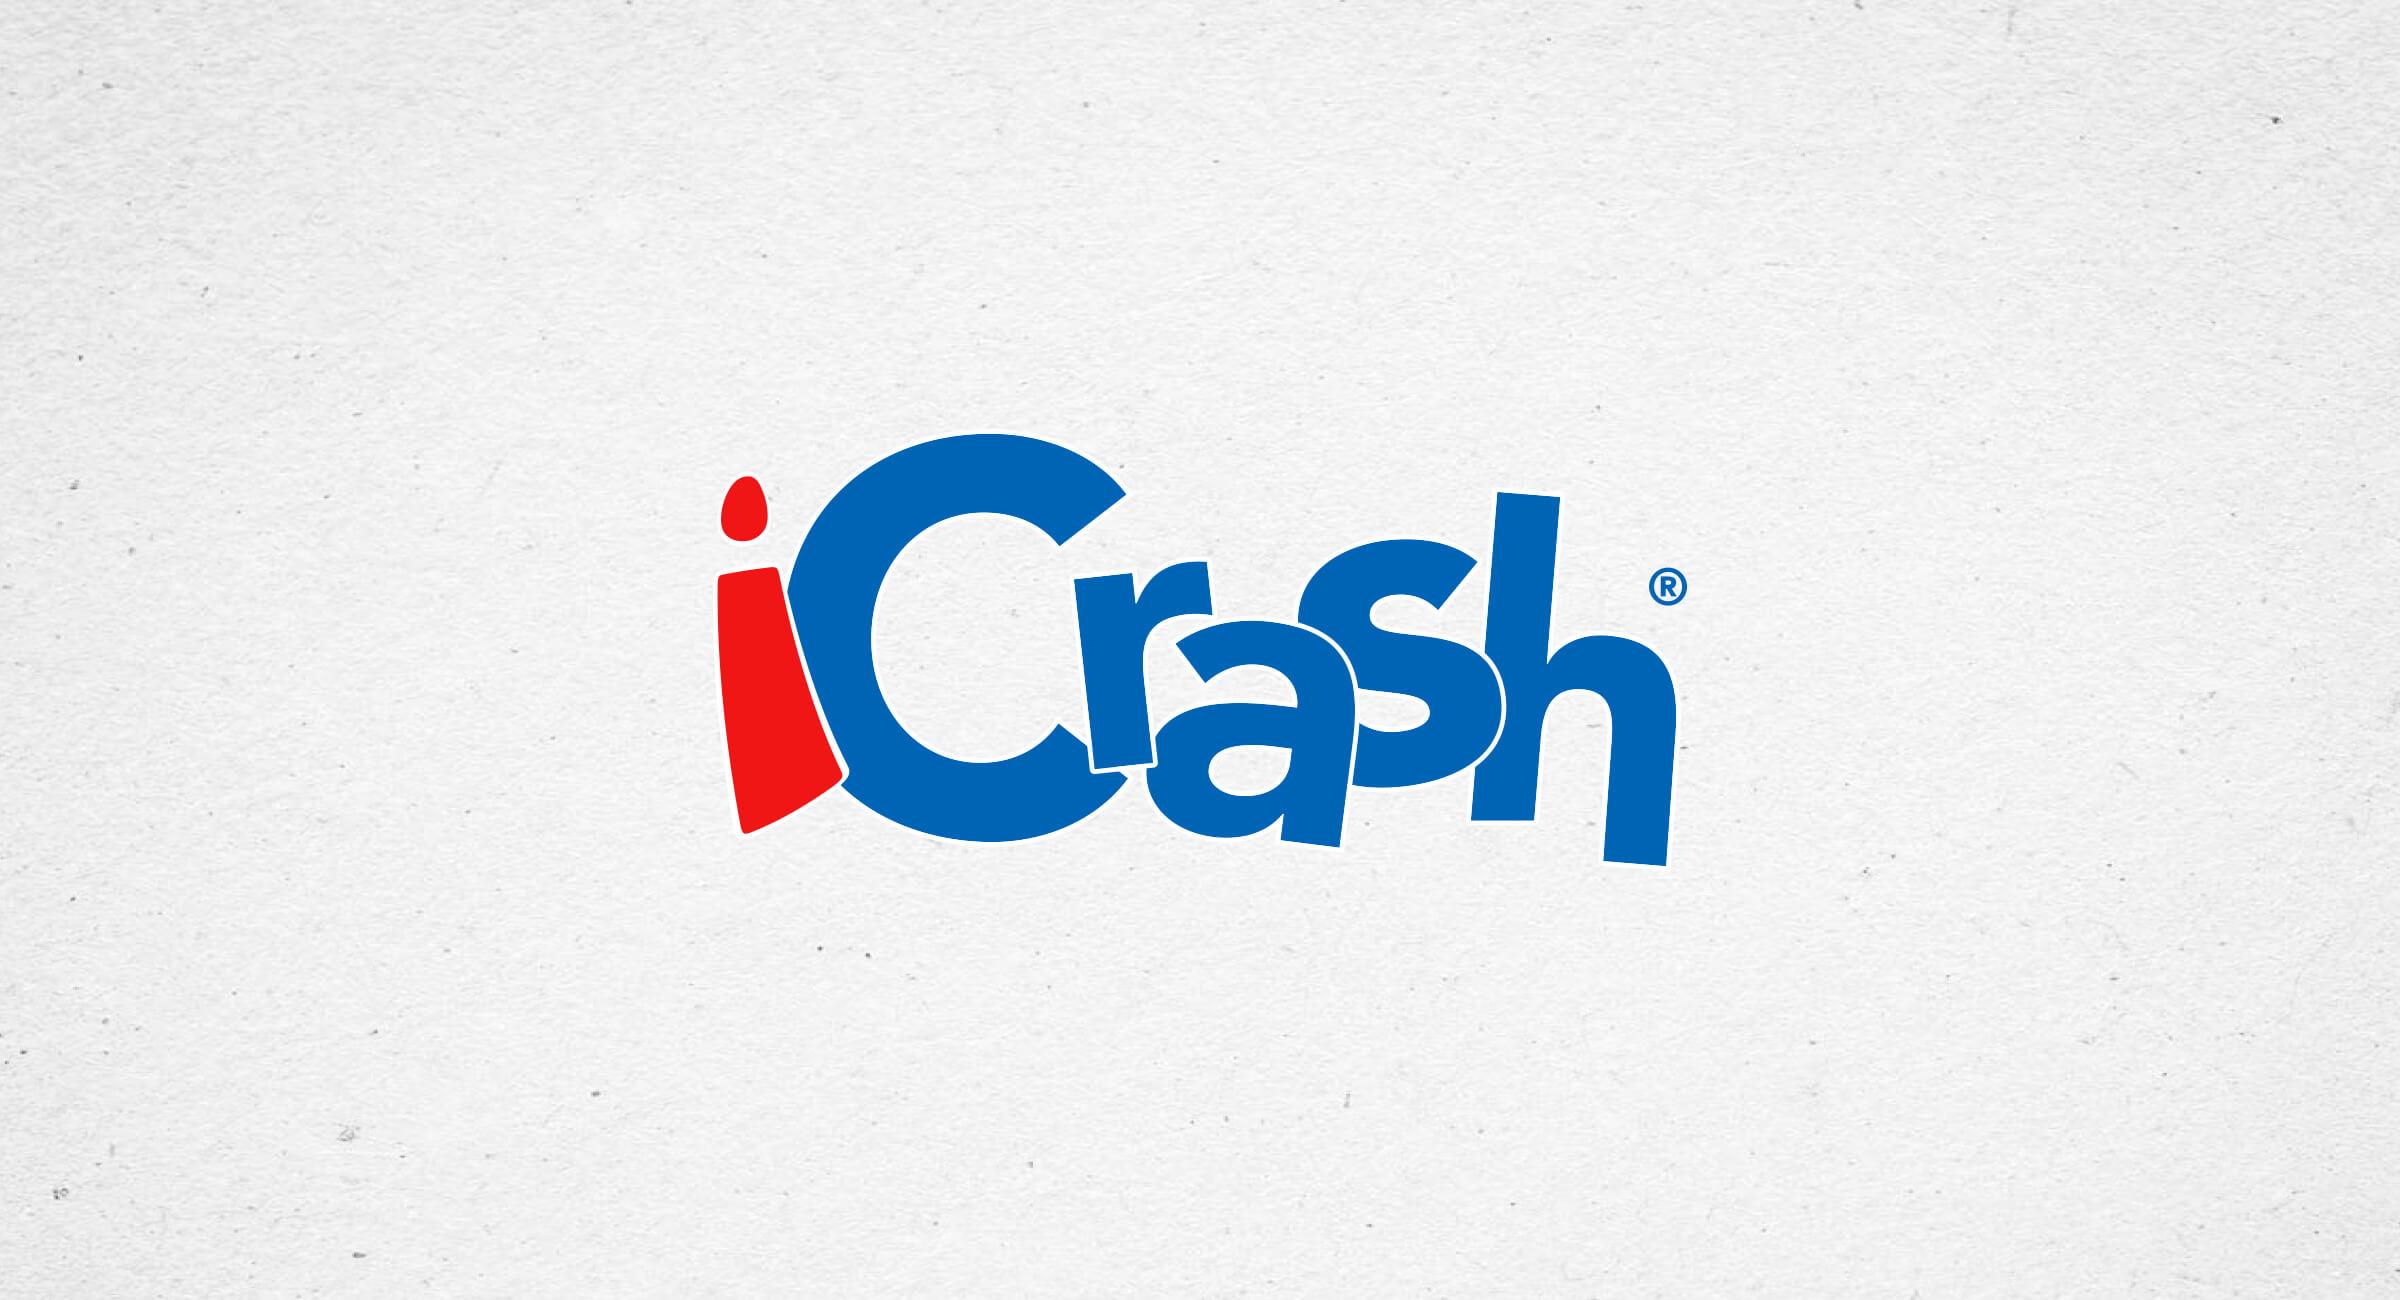 iCrash-logo-design-OnOff-Communication